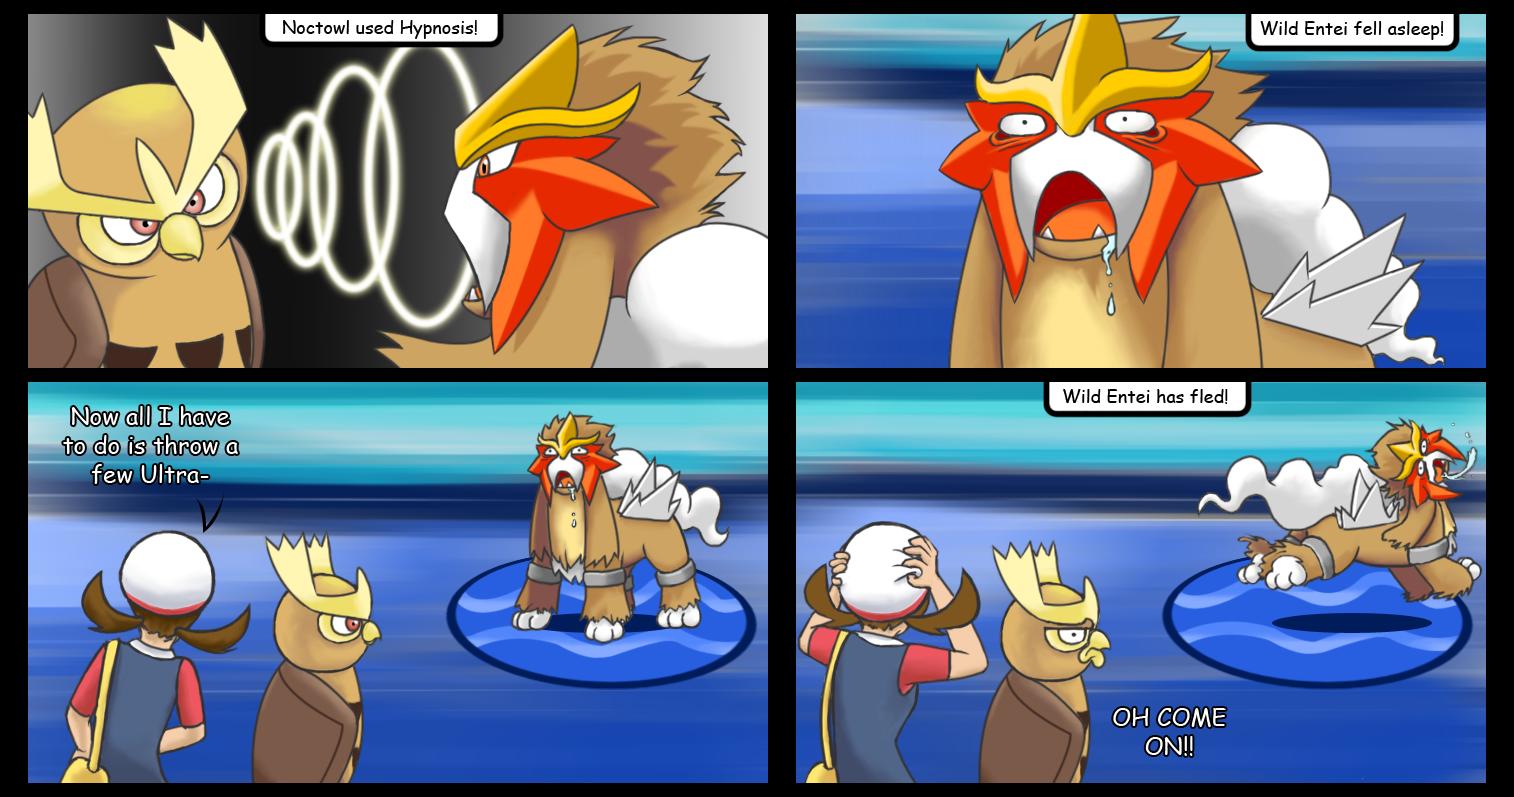 PokemonElite!: March 2012 Wailord Used Body Slam